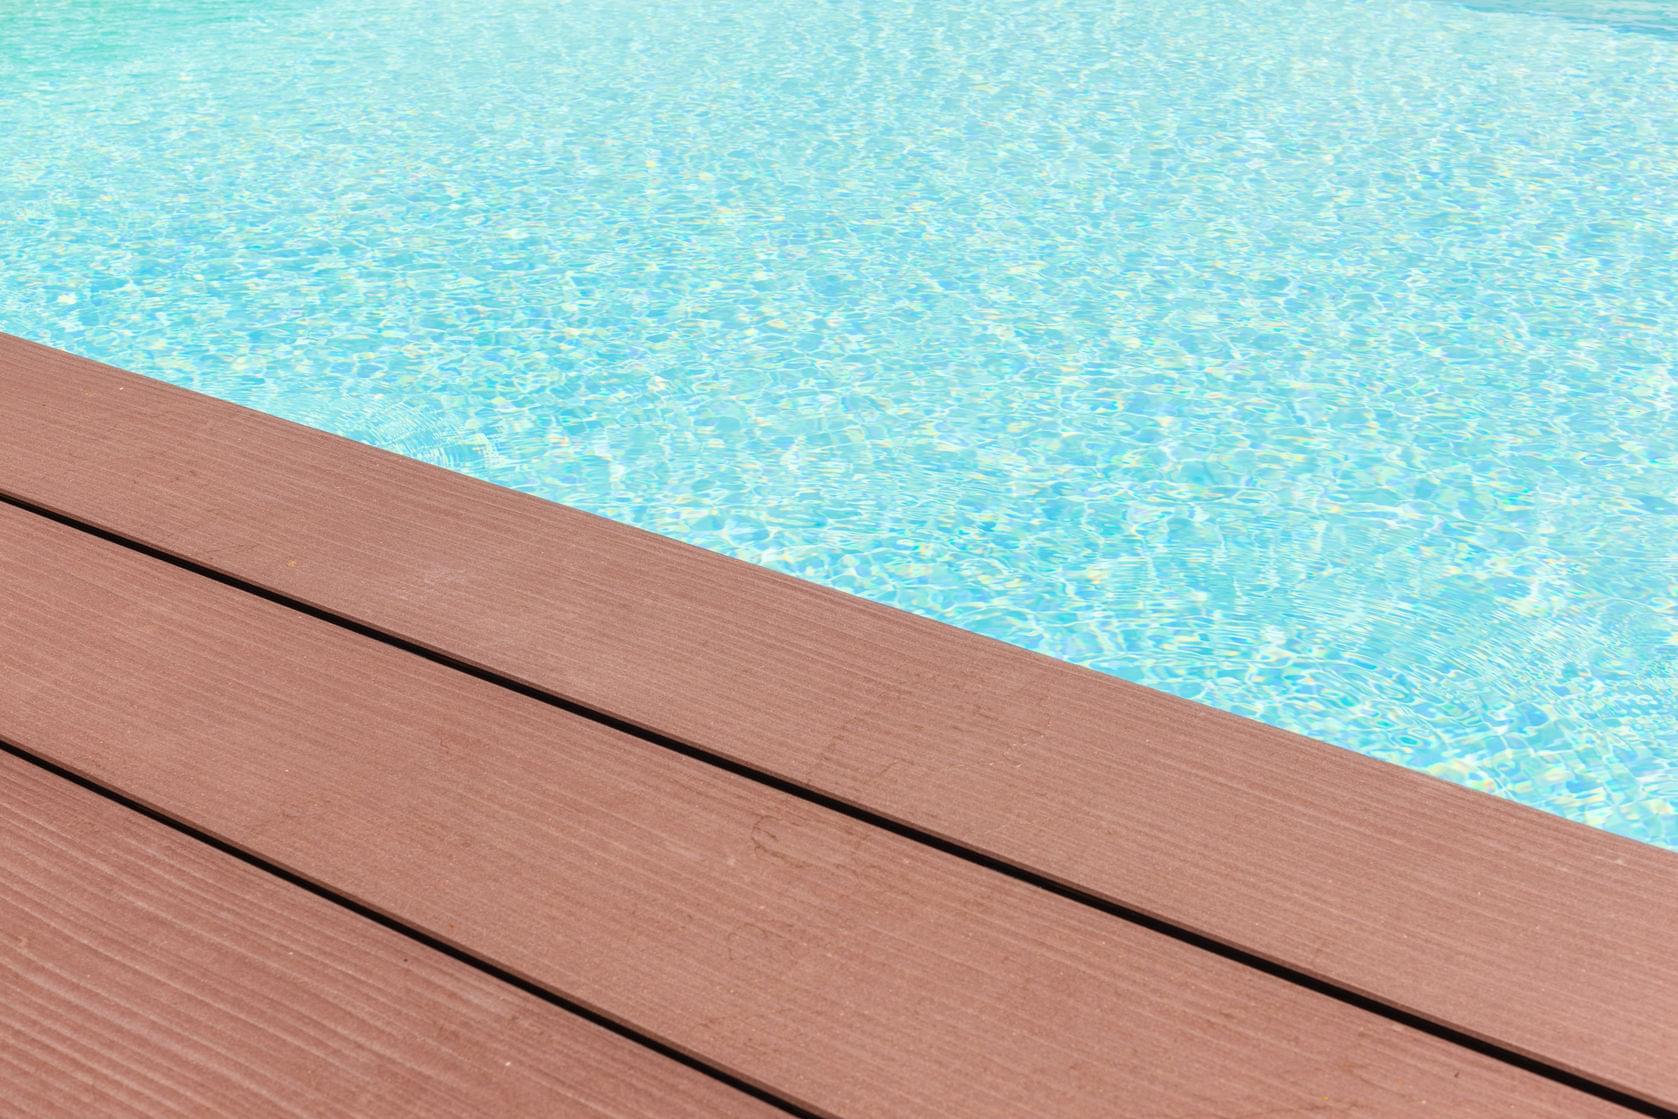 gfk schwimmbecken farbe gl nzend in ral farben bekateq. Black Bedroom Furniture Sets. Home Design Ideas